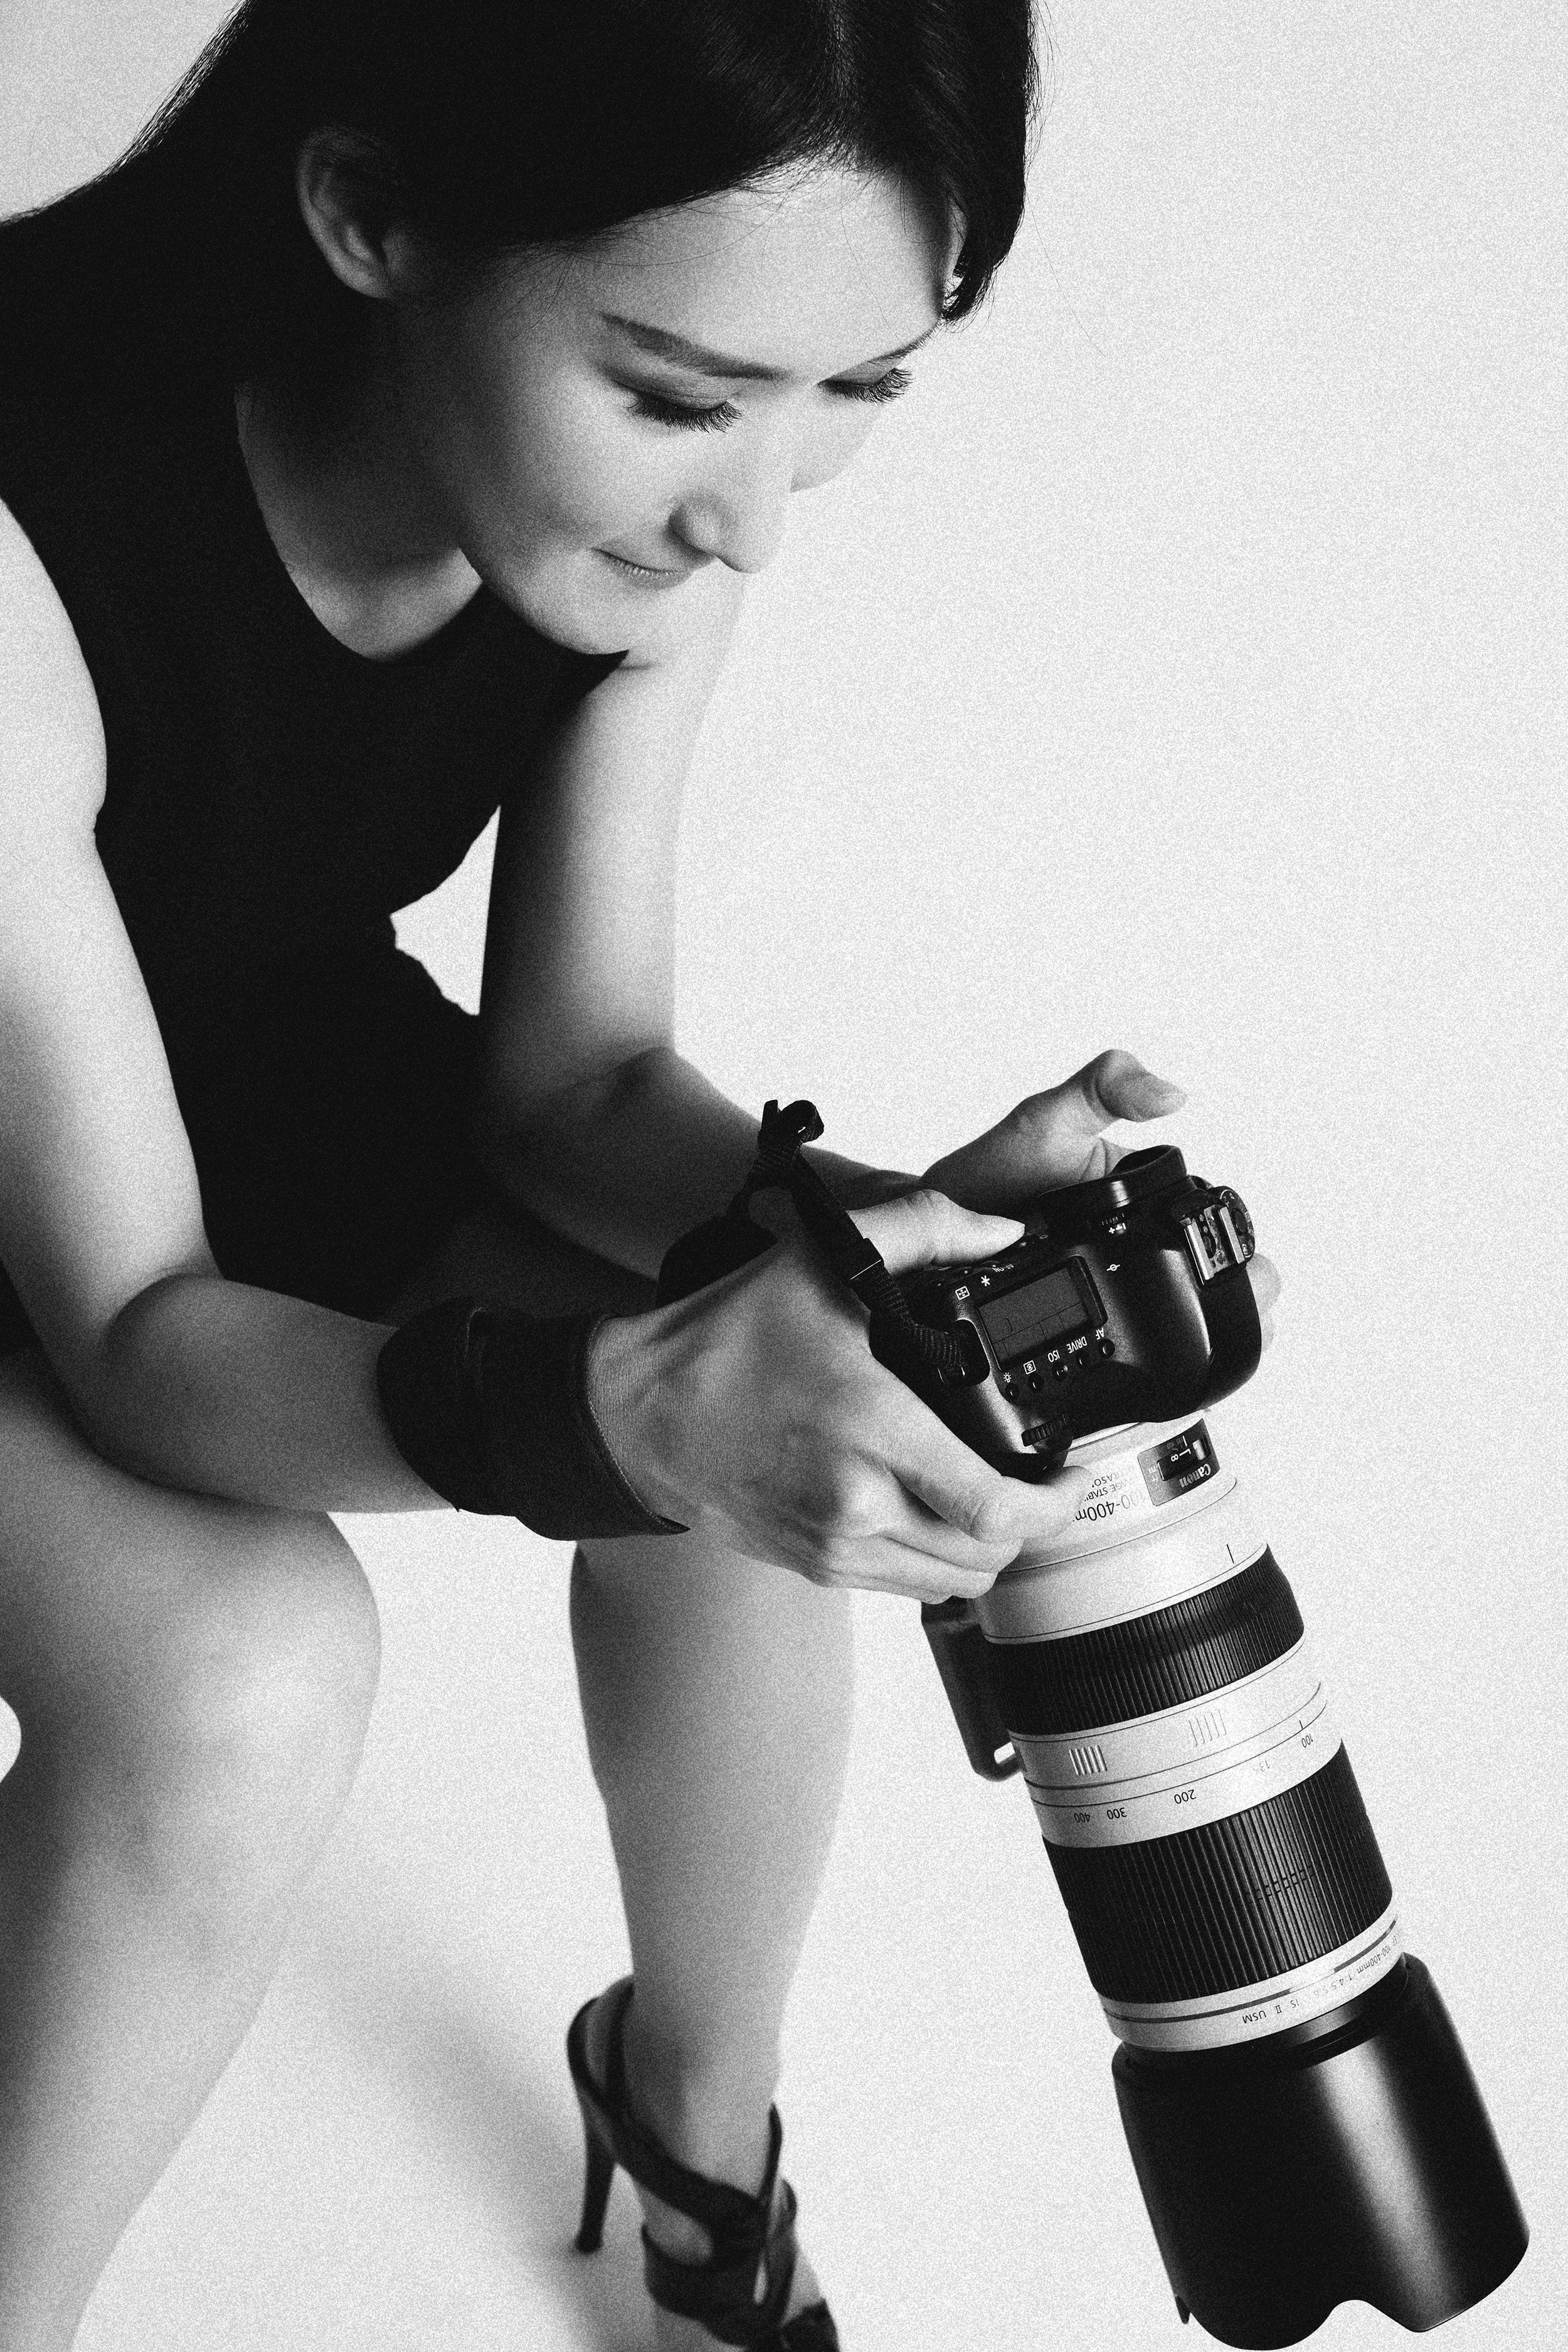 JC CREATIVE 女性攝影師   形像照 人像寫真  photogrpaher   台北推薦婚攝 自然風格 溫度故事 孕婦 愛  台北家庭寫真  自宅 獨立攝影師JC   PHOTOGRAPHY   PORTRAIT 圖像00003.JPG